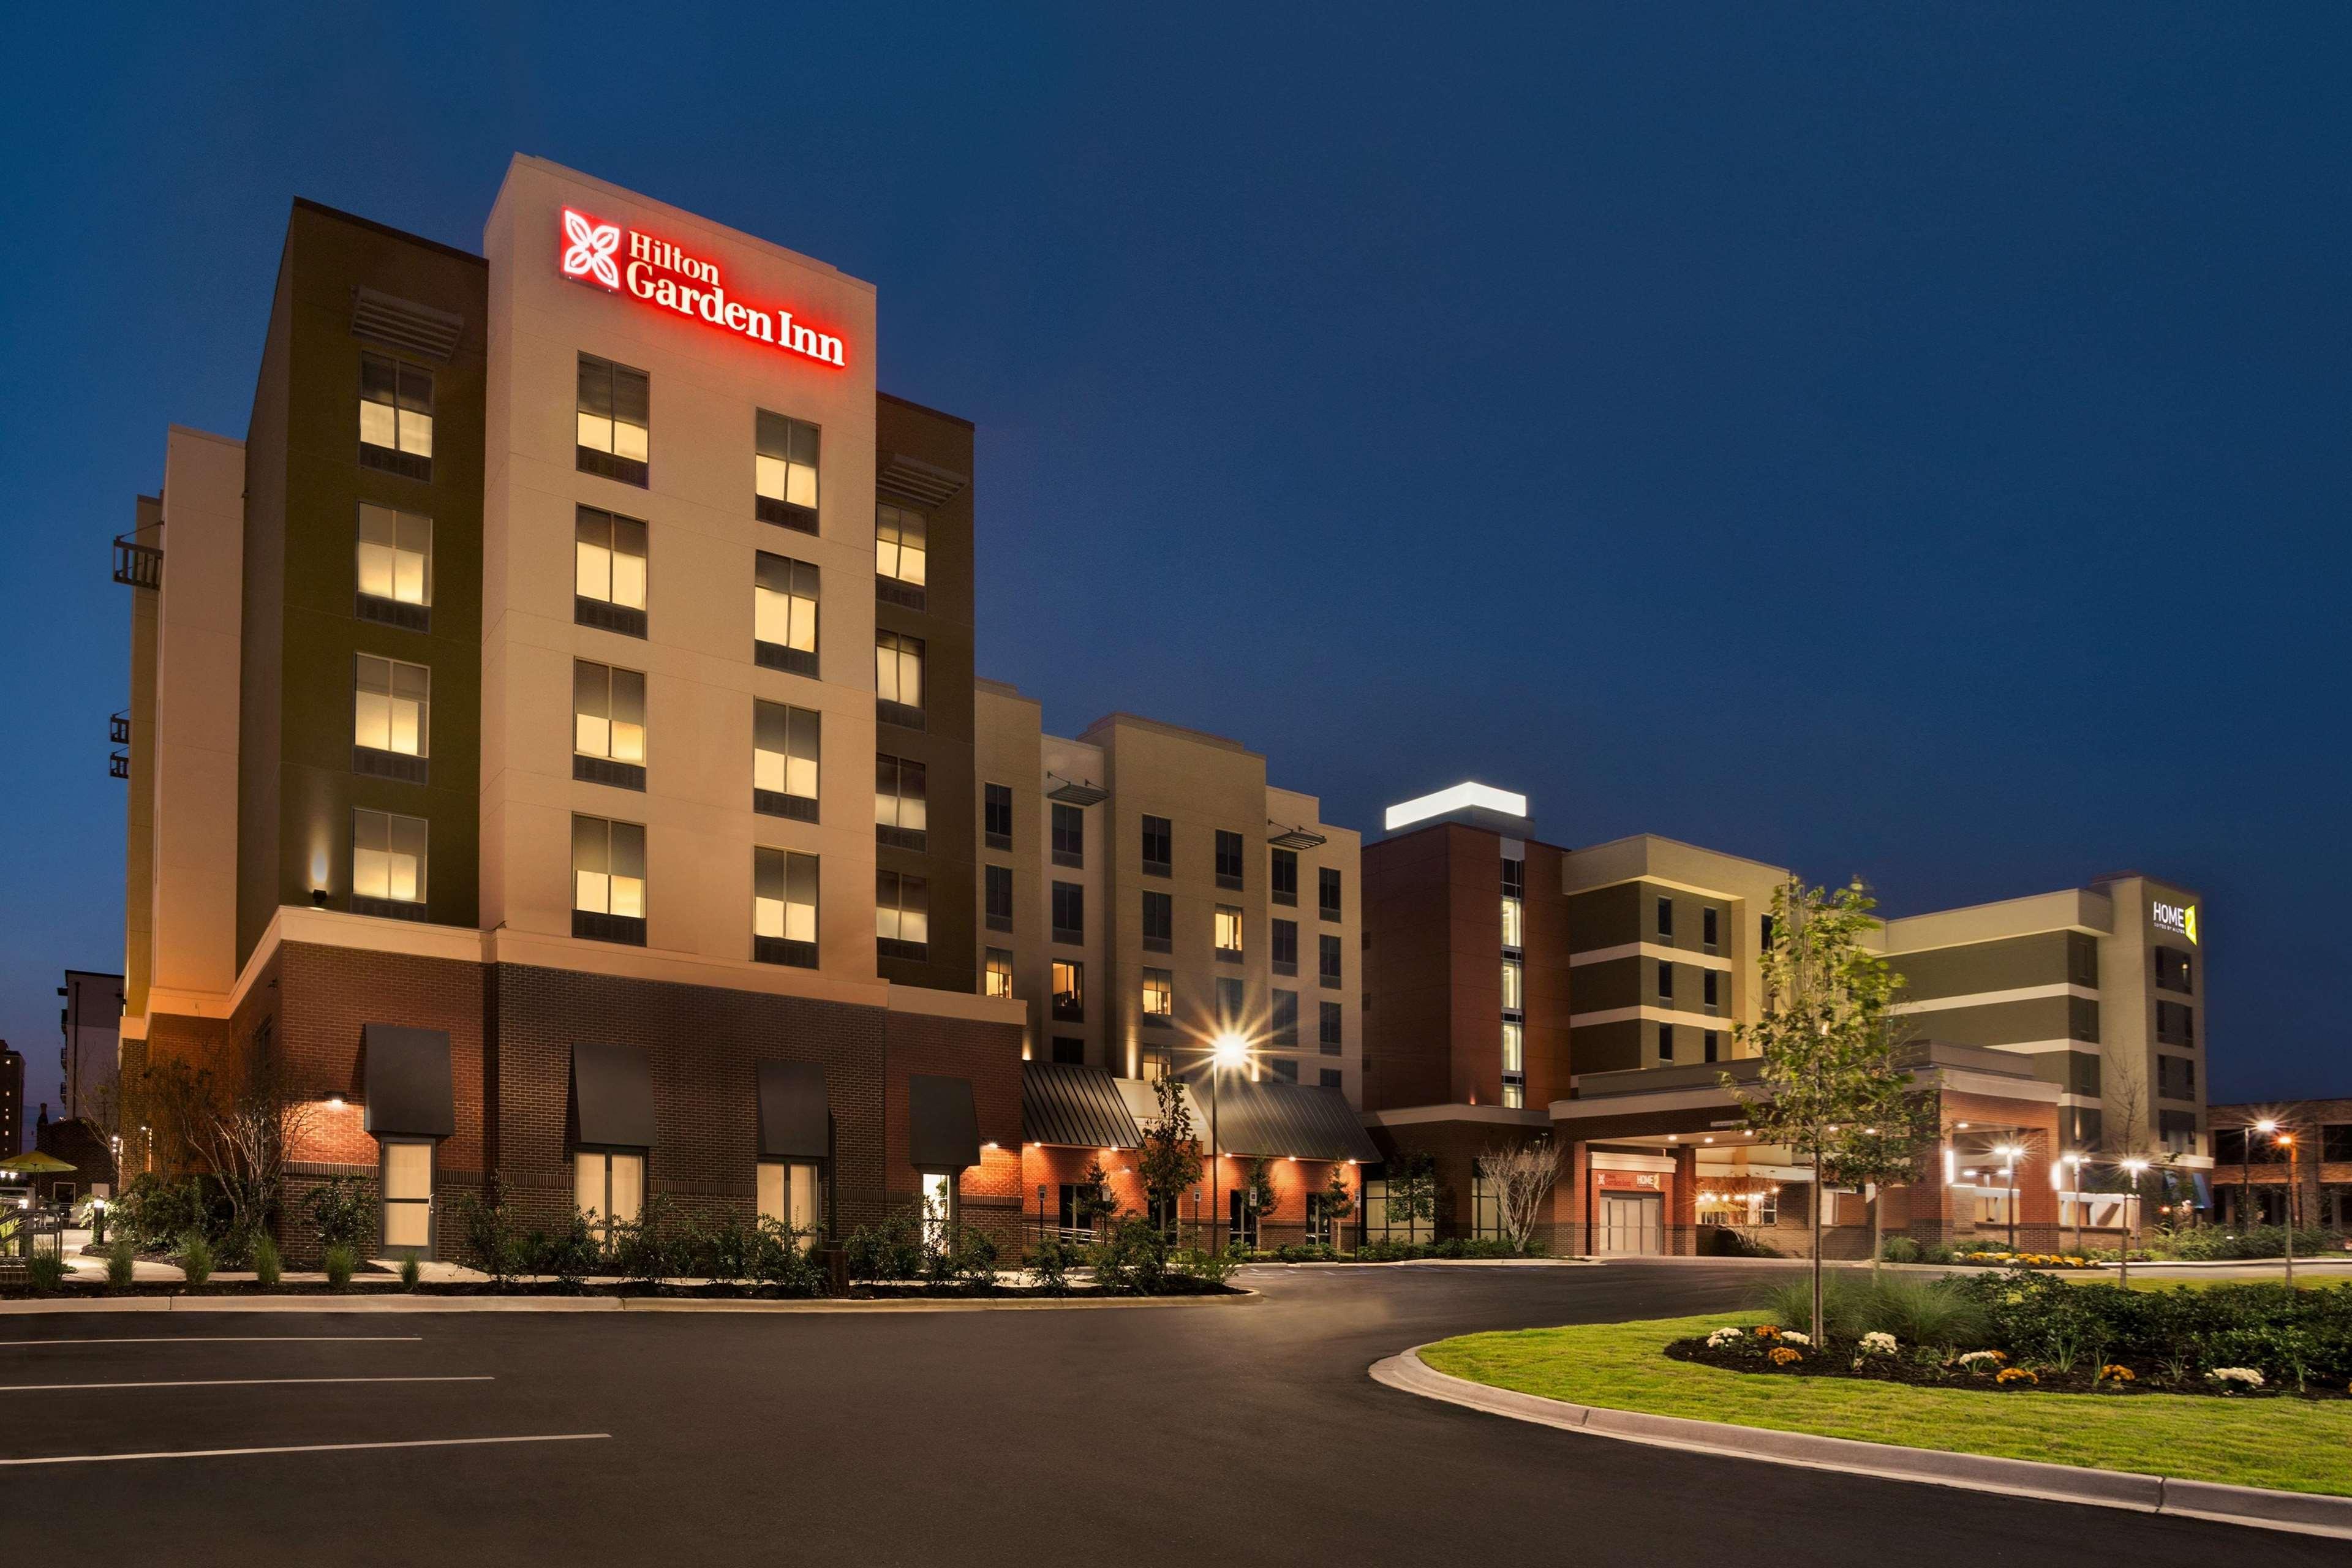 Hilton Garden Inn Downtown Birmingham In Birmingham Al 35233